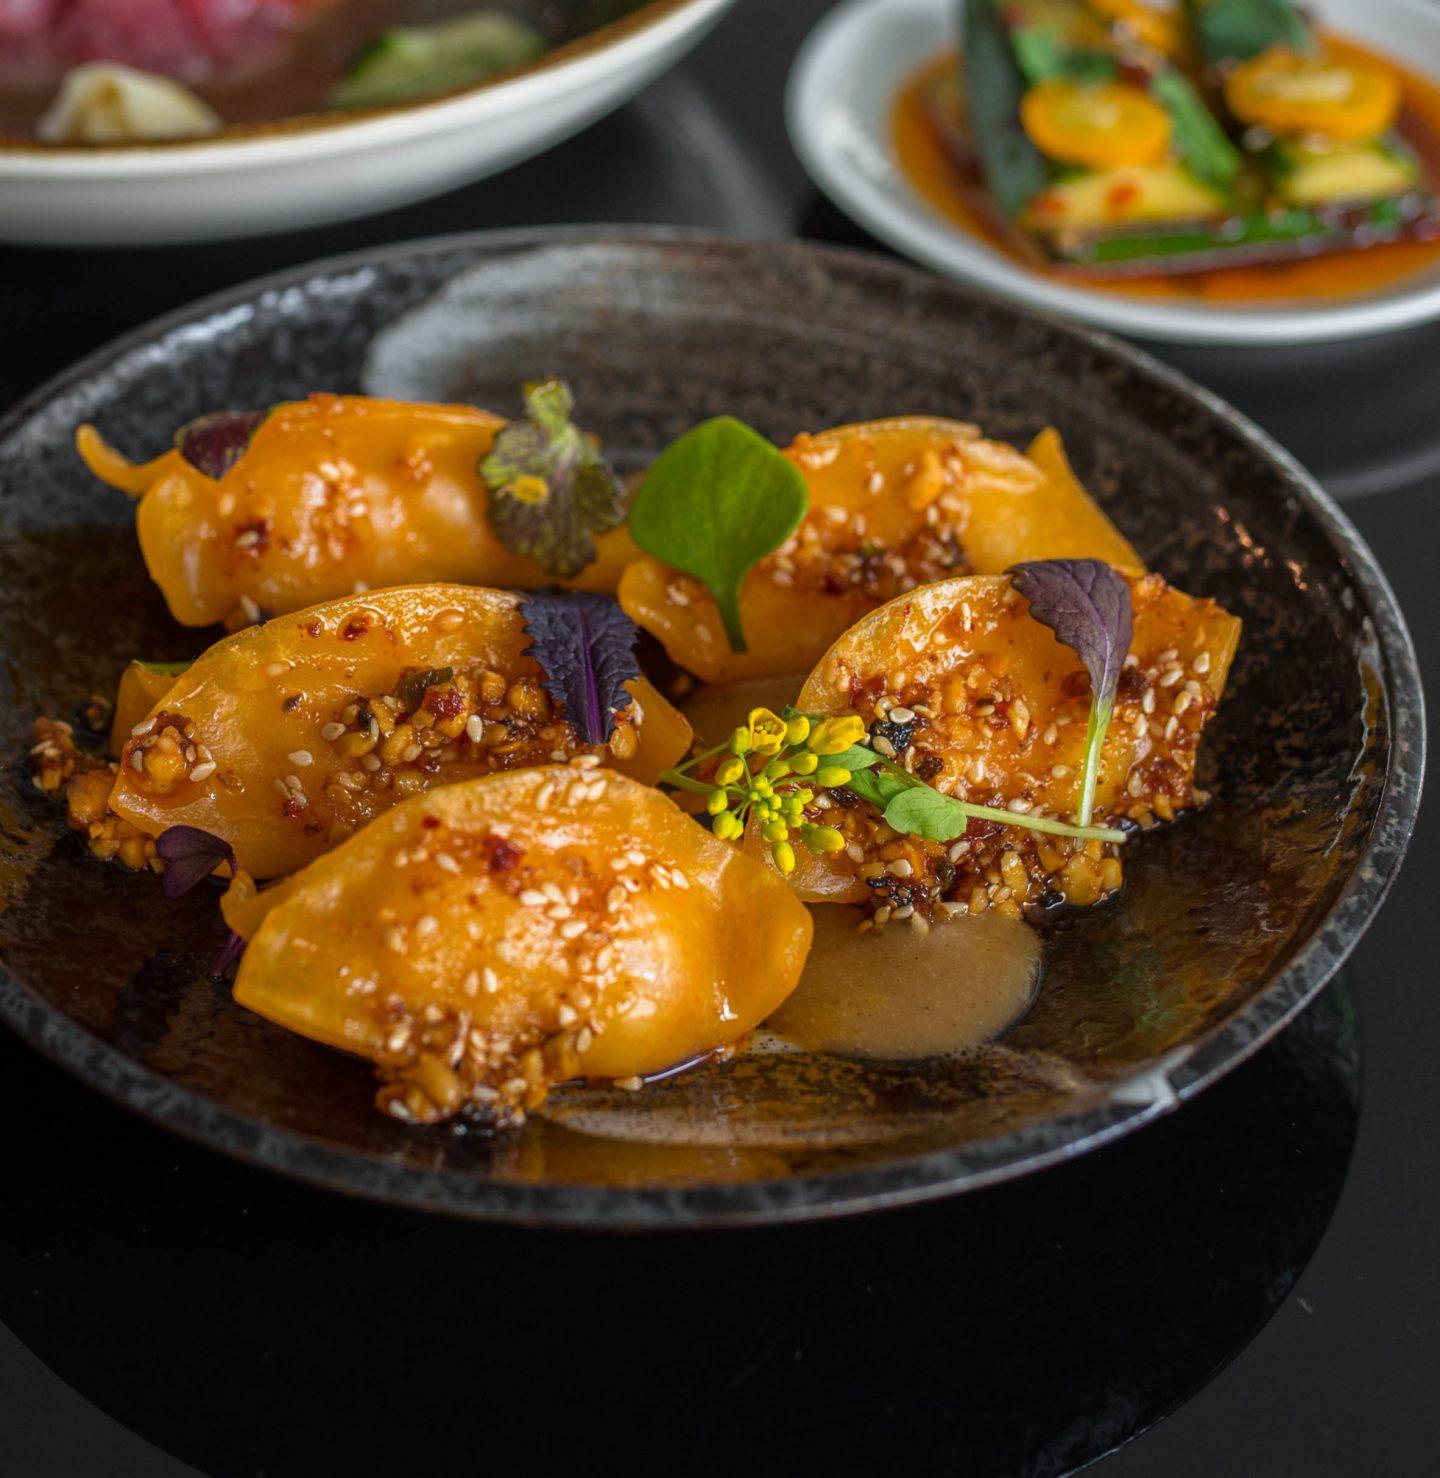 carrot dumplings